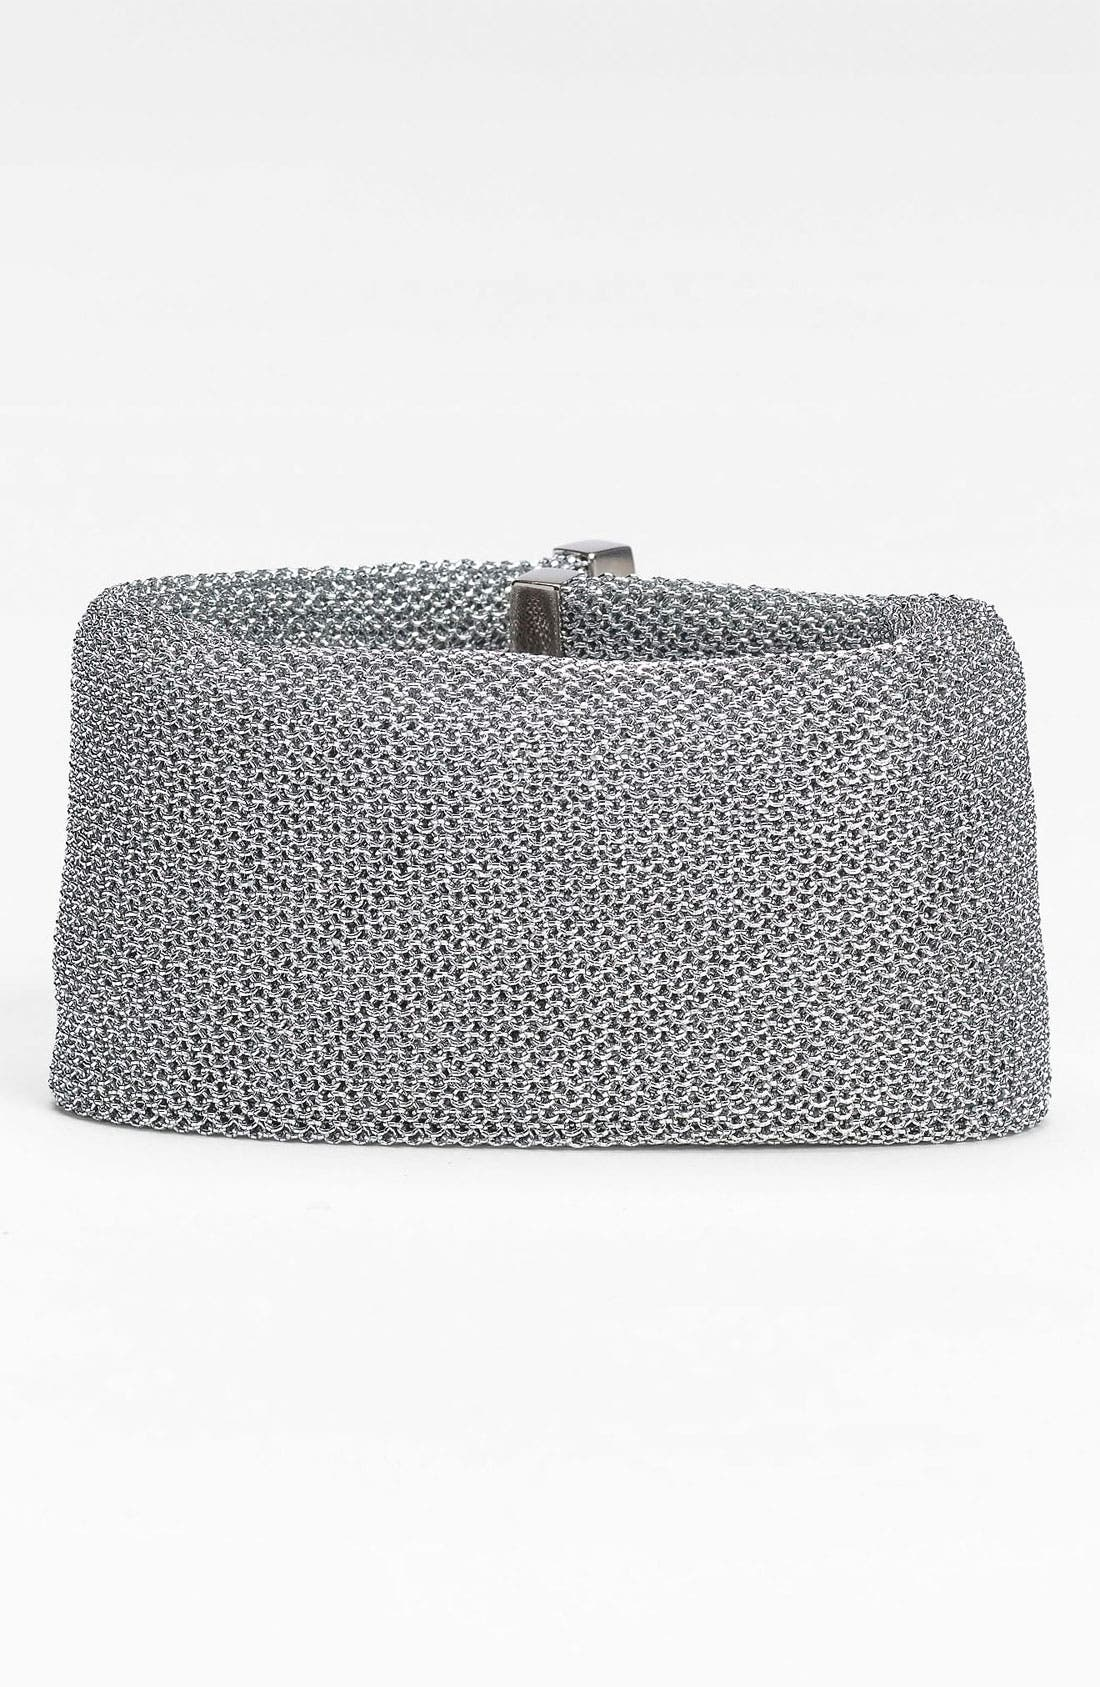 Alternate Image 1 Selected - Adami & Martucci 'Mesh' Line Bracelet